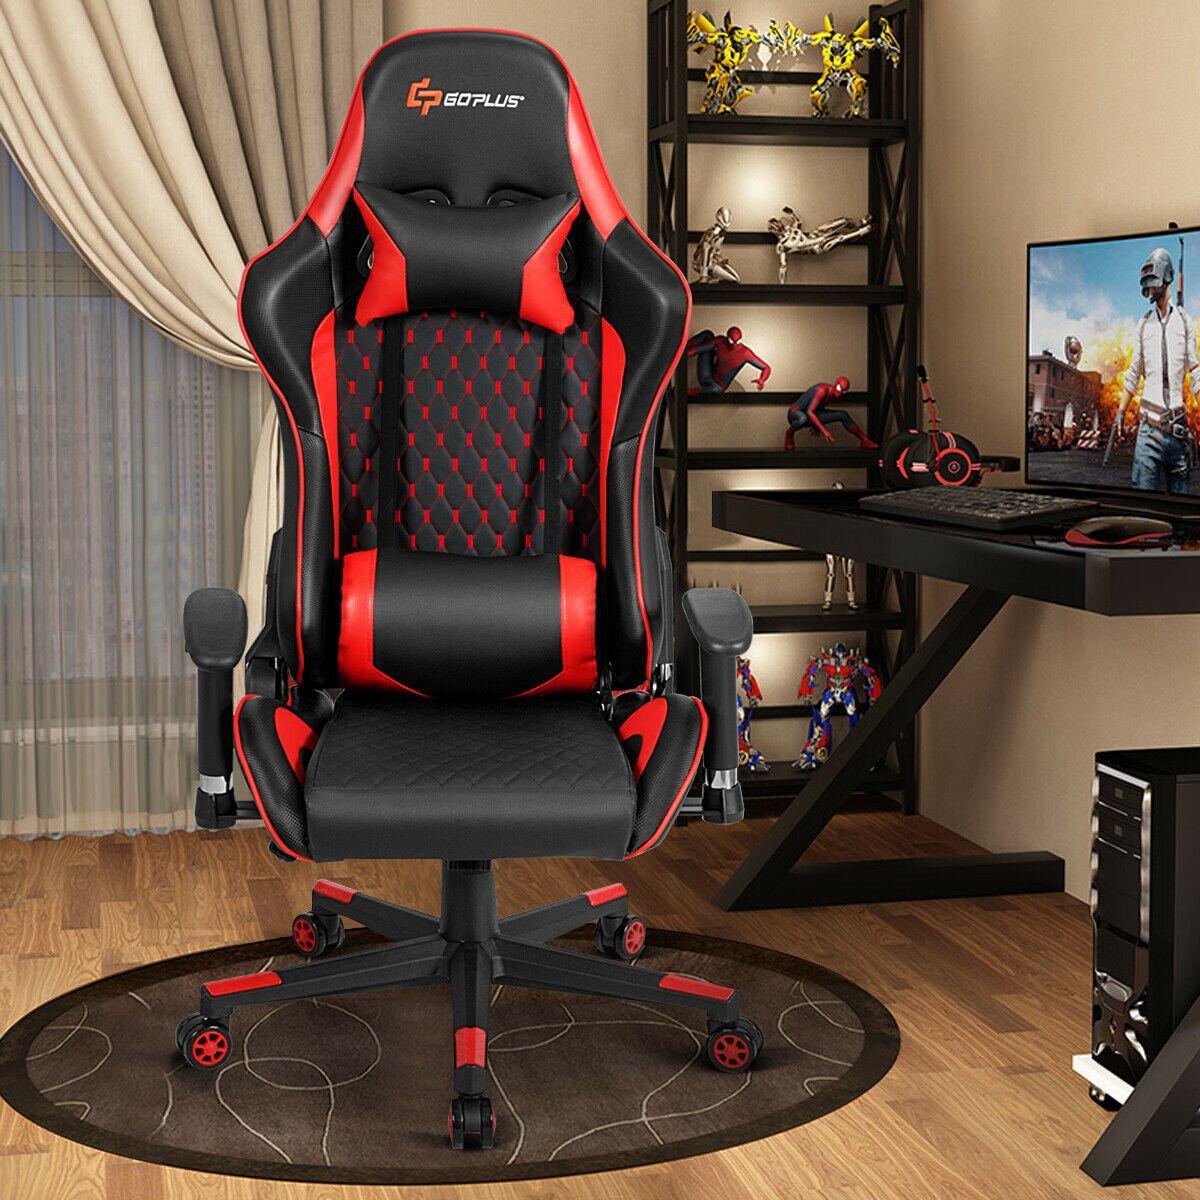 Lumbar Support and Headrest Massage Reclining Gaming Chair